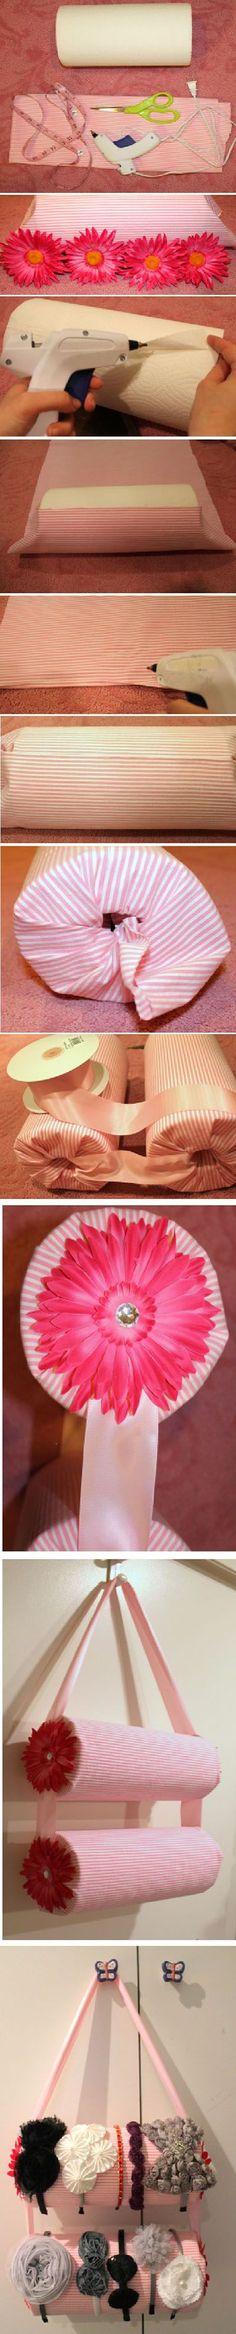 So Beautiful Organizer | DIY & Crafts Tutorials